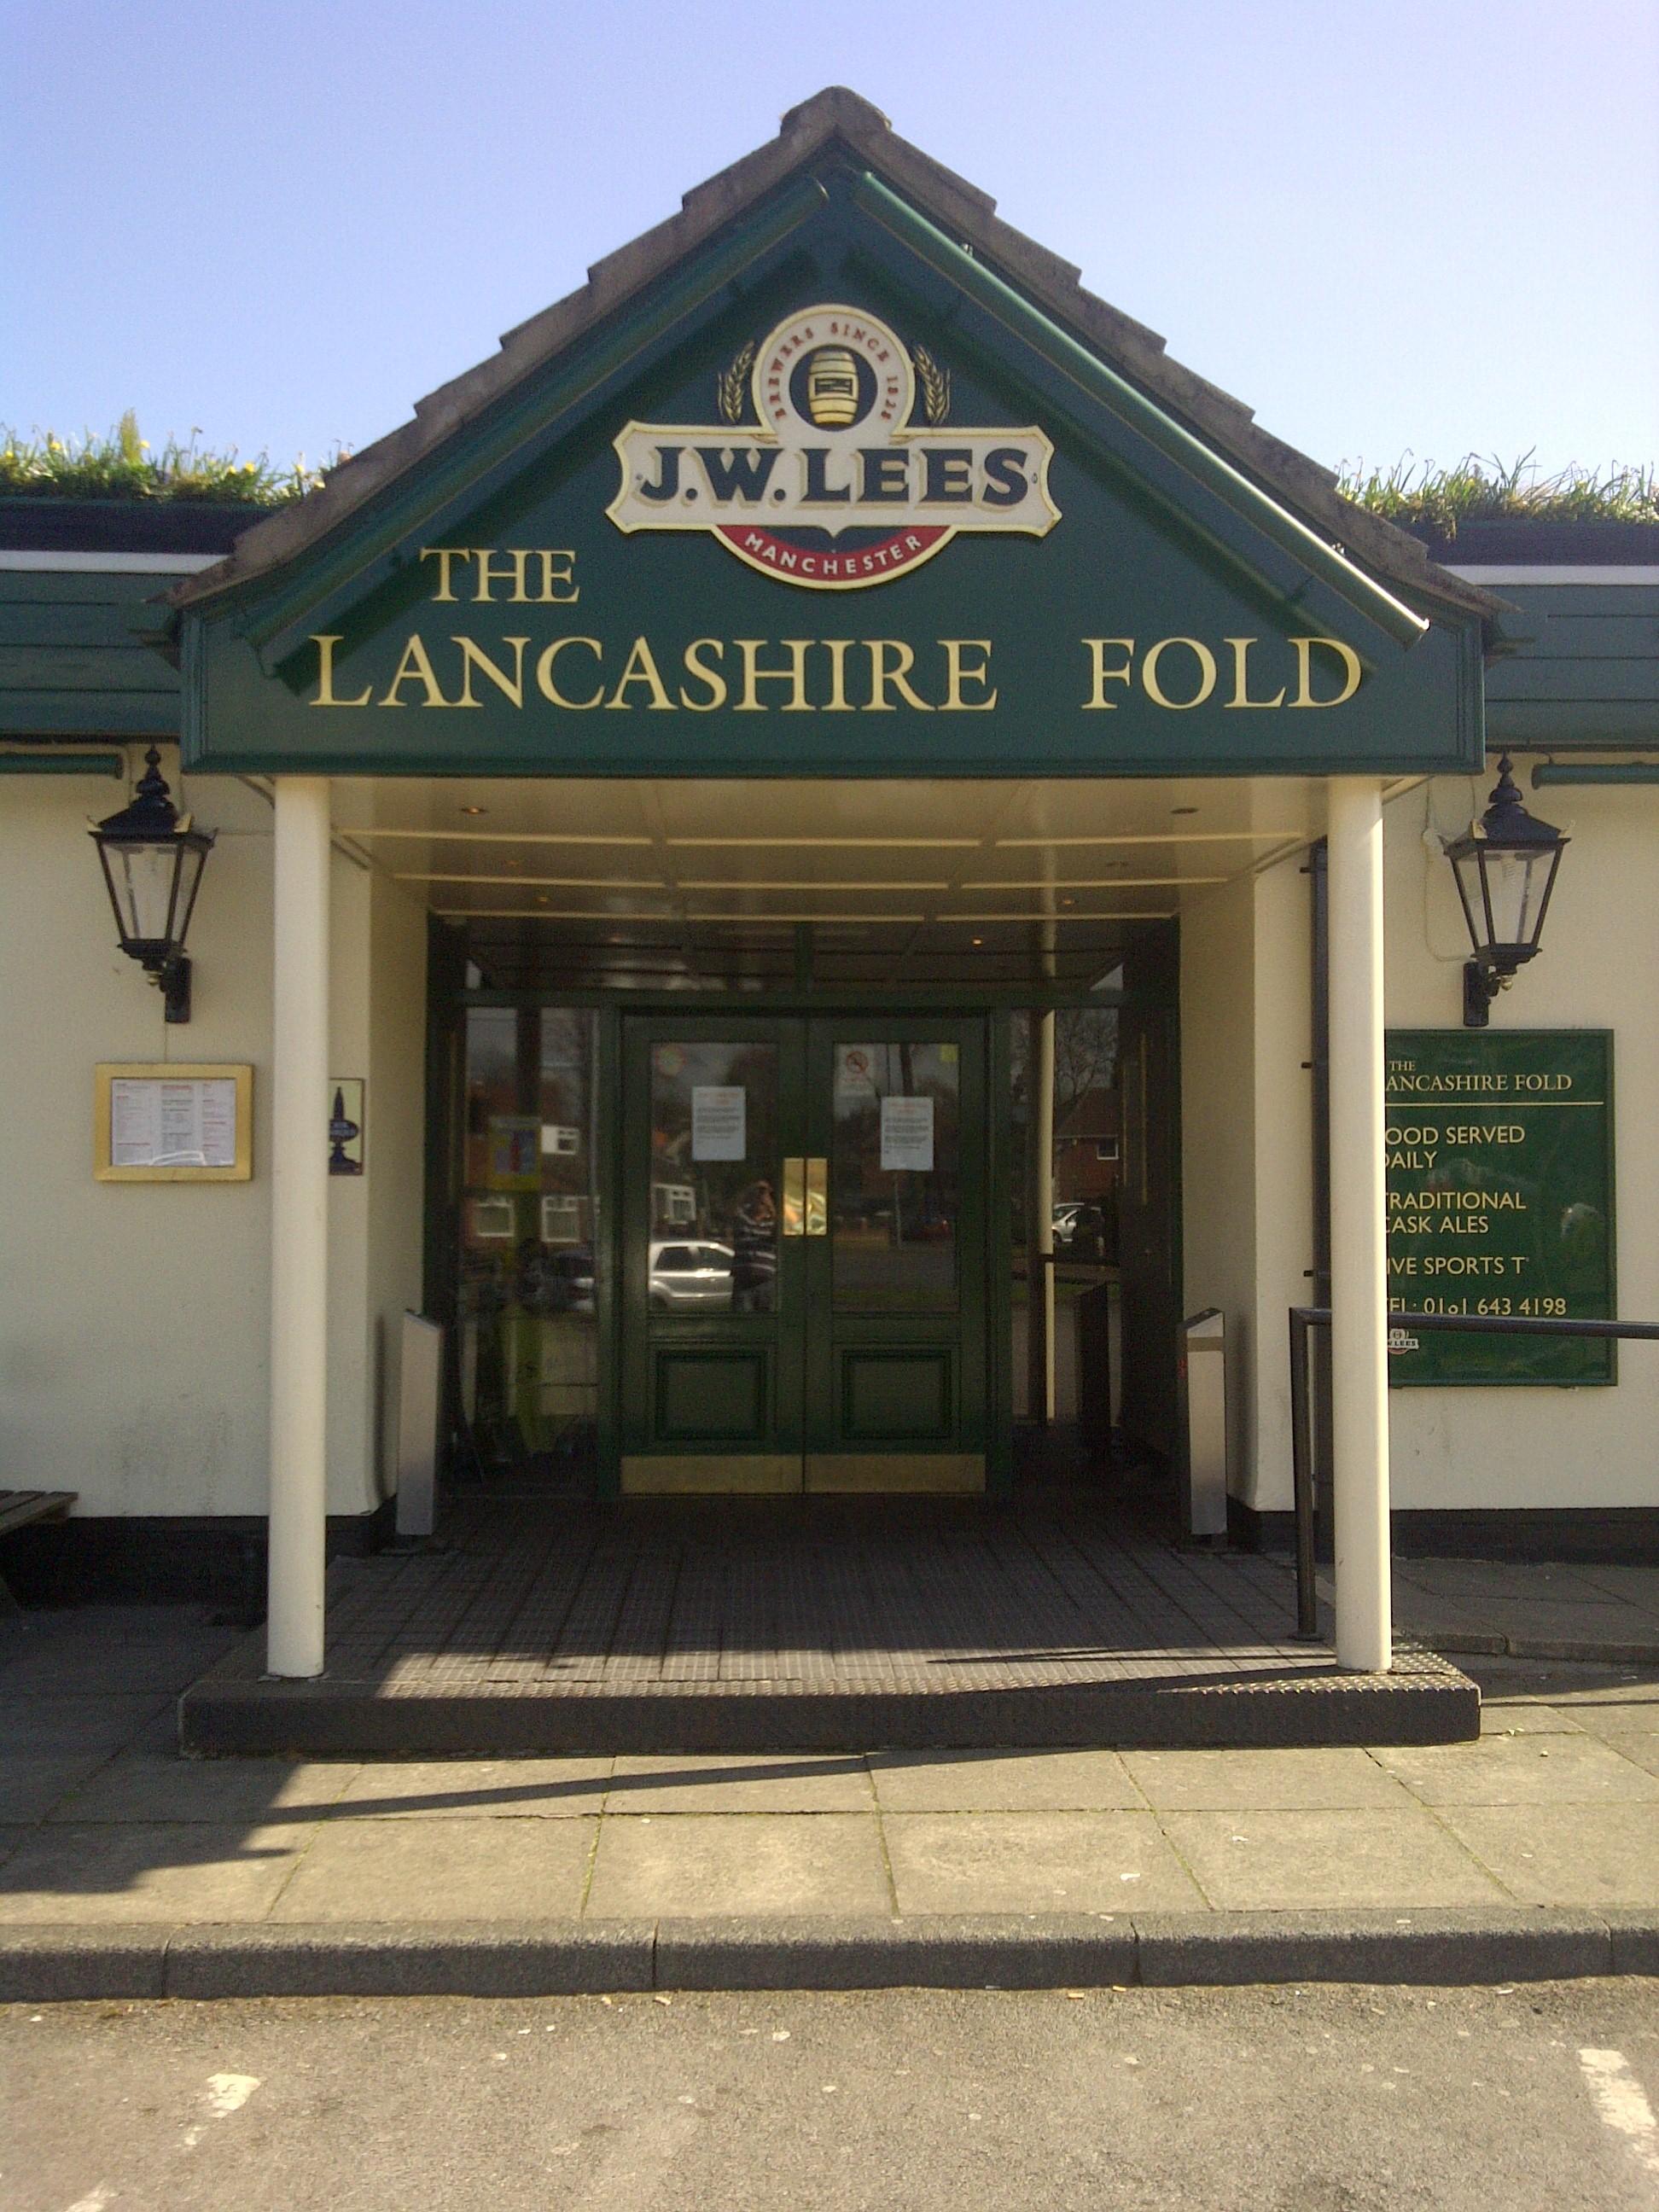 The Lancashire Fold